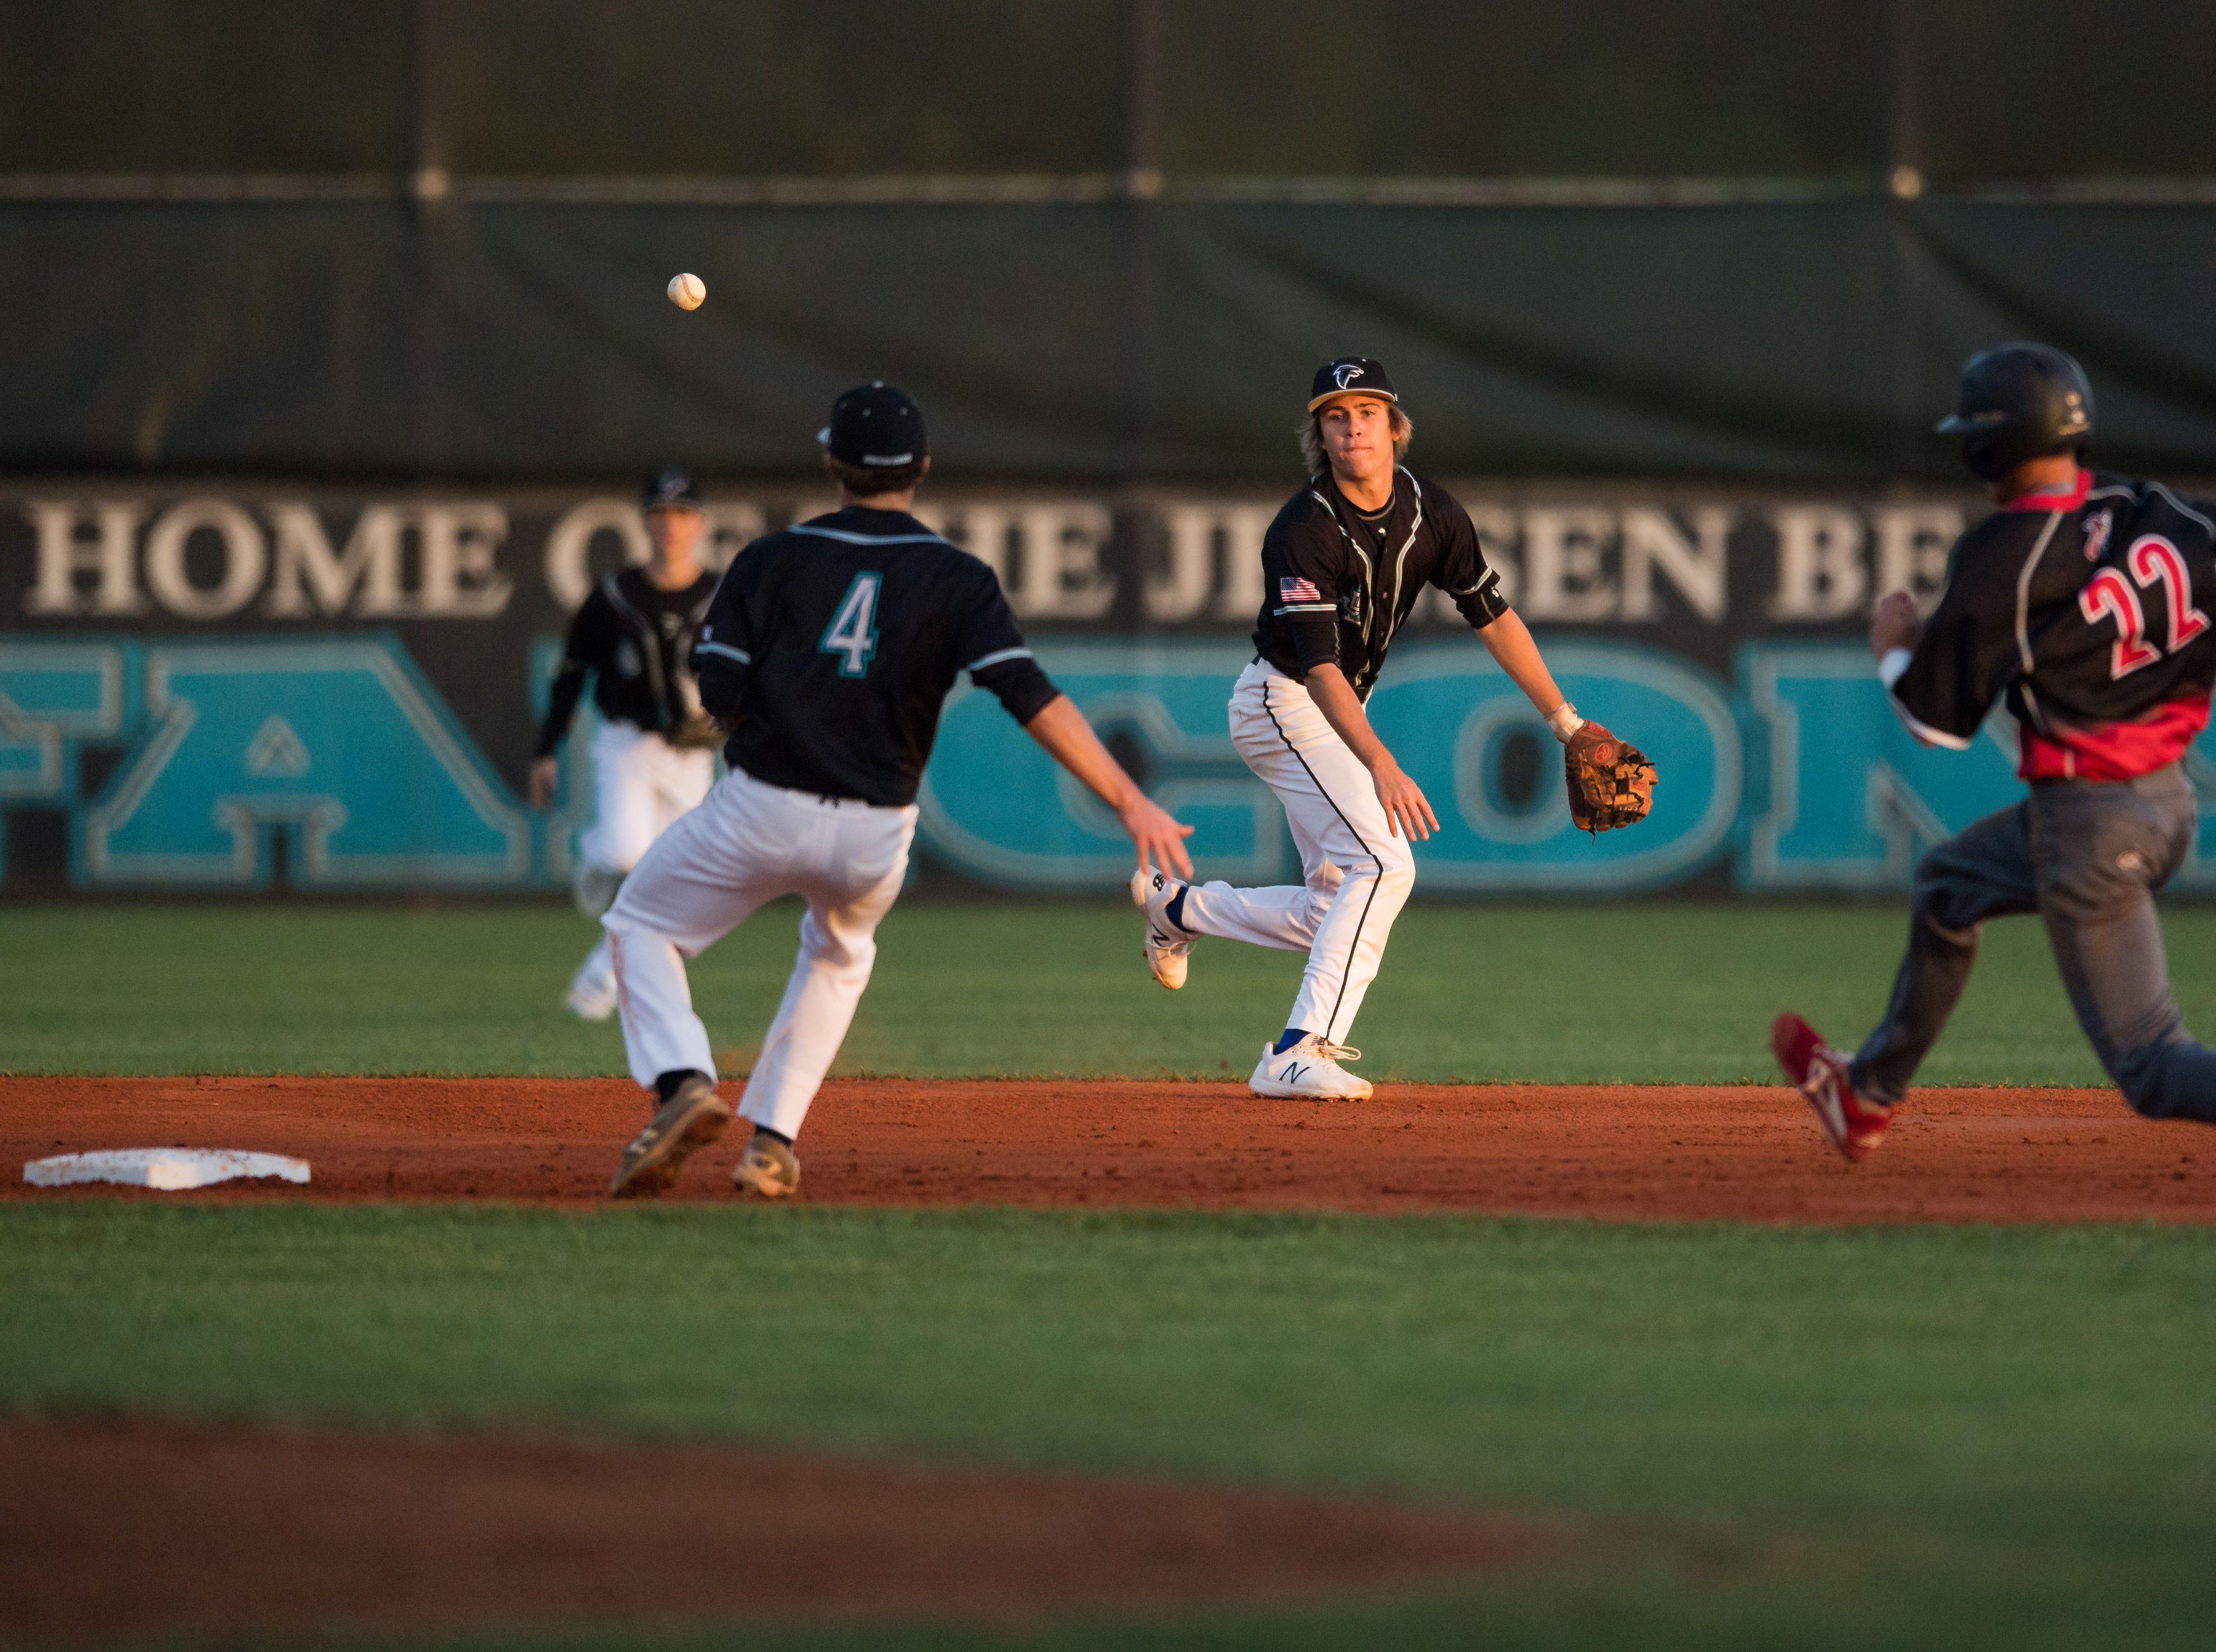 Vero Beach plays against Jensen Beach during the high school baseball game Thursday, March 7, 2019, at Jensen Beach High School.